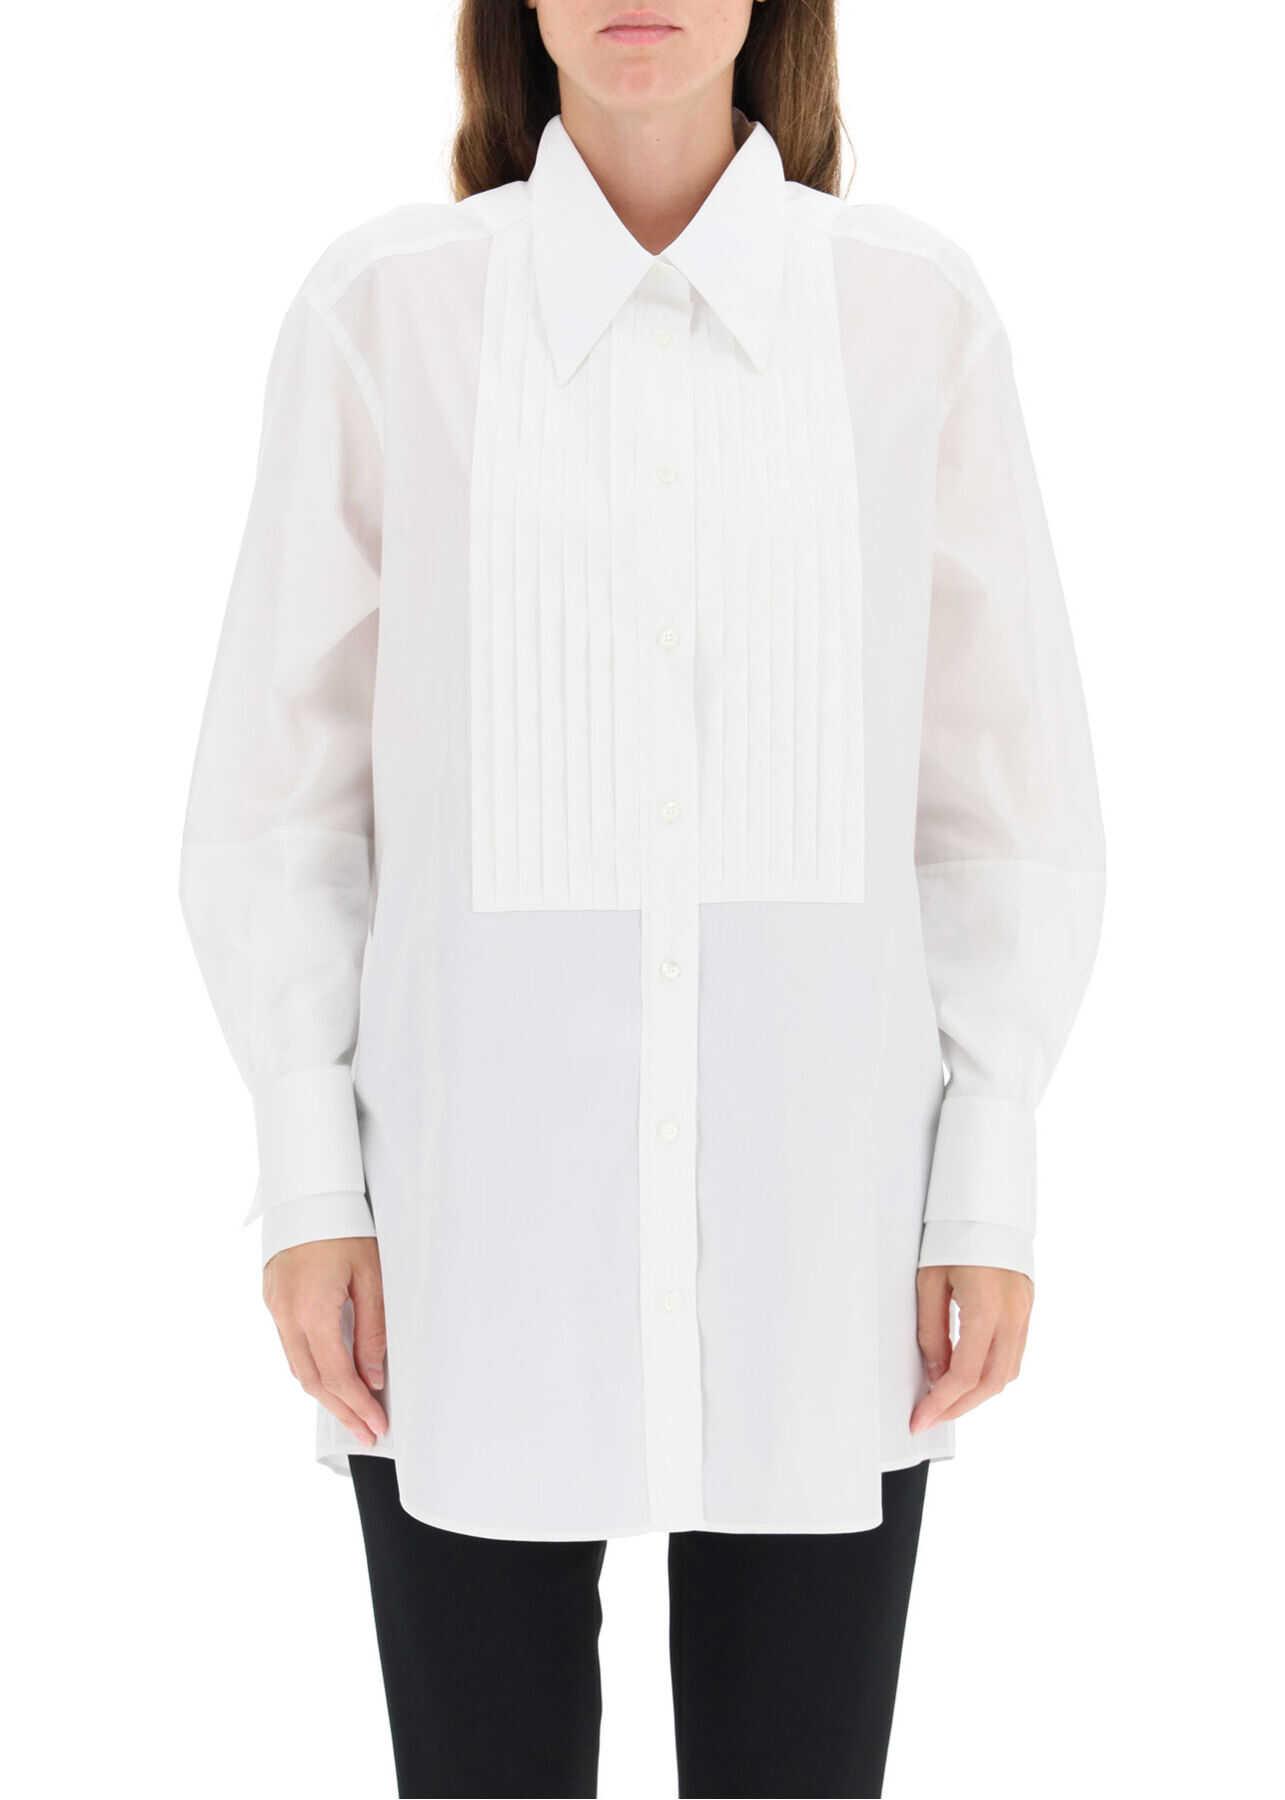 Dolce & Gabbana Oversized Cotton Shirt F5N99T FU5K9 BIANCO OTTICO image0